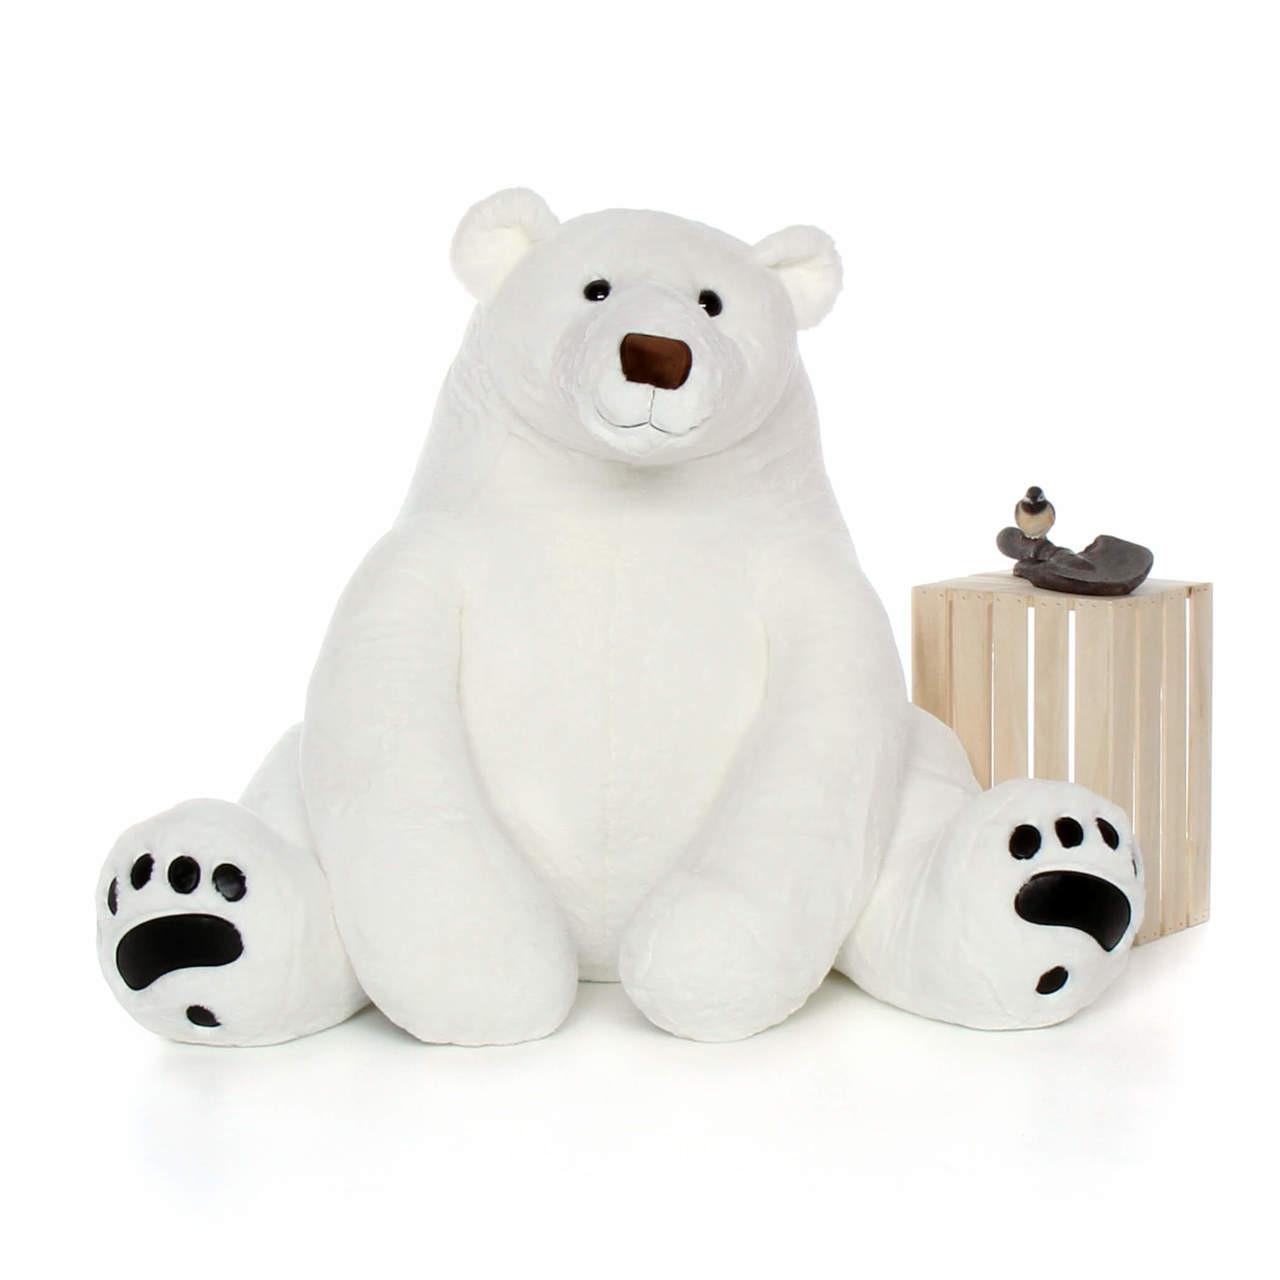 Fullsize Of Polar Bear Stuffed Animal